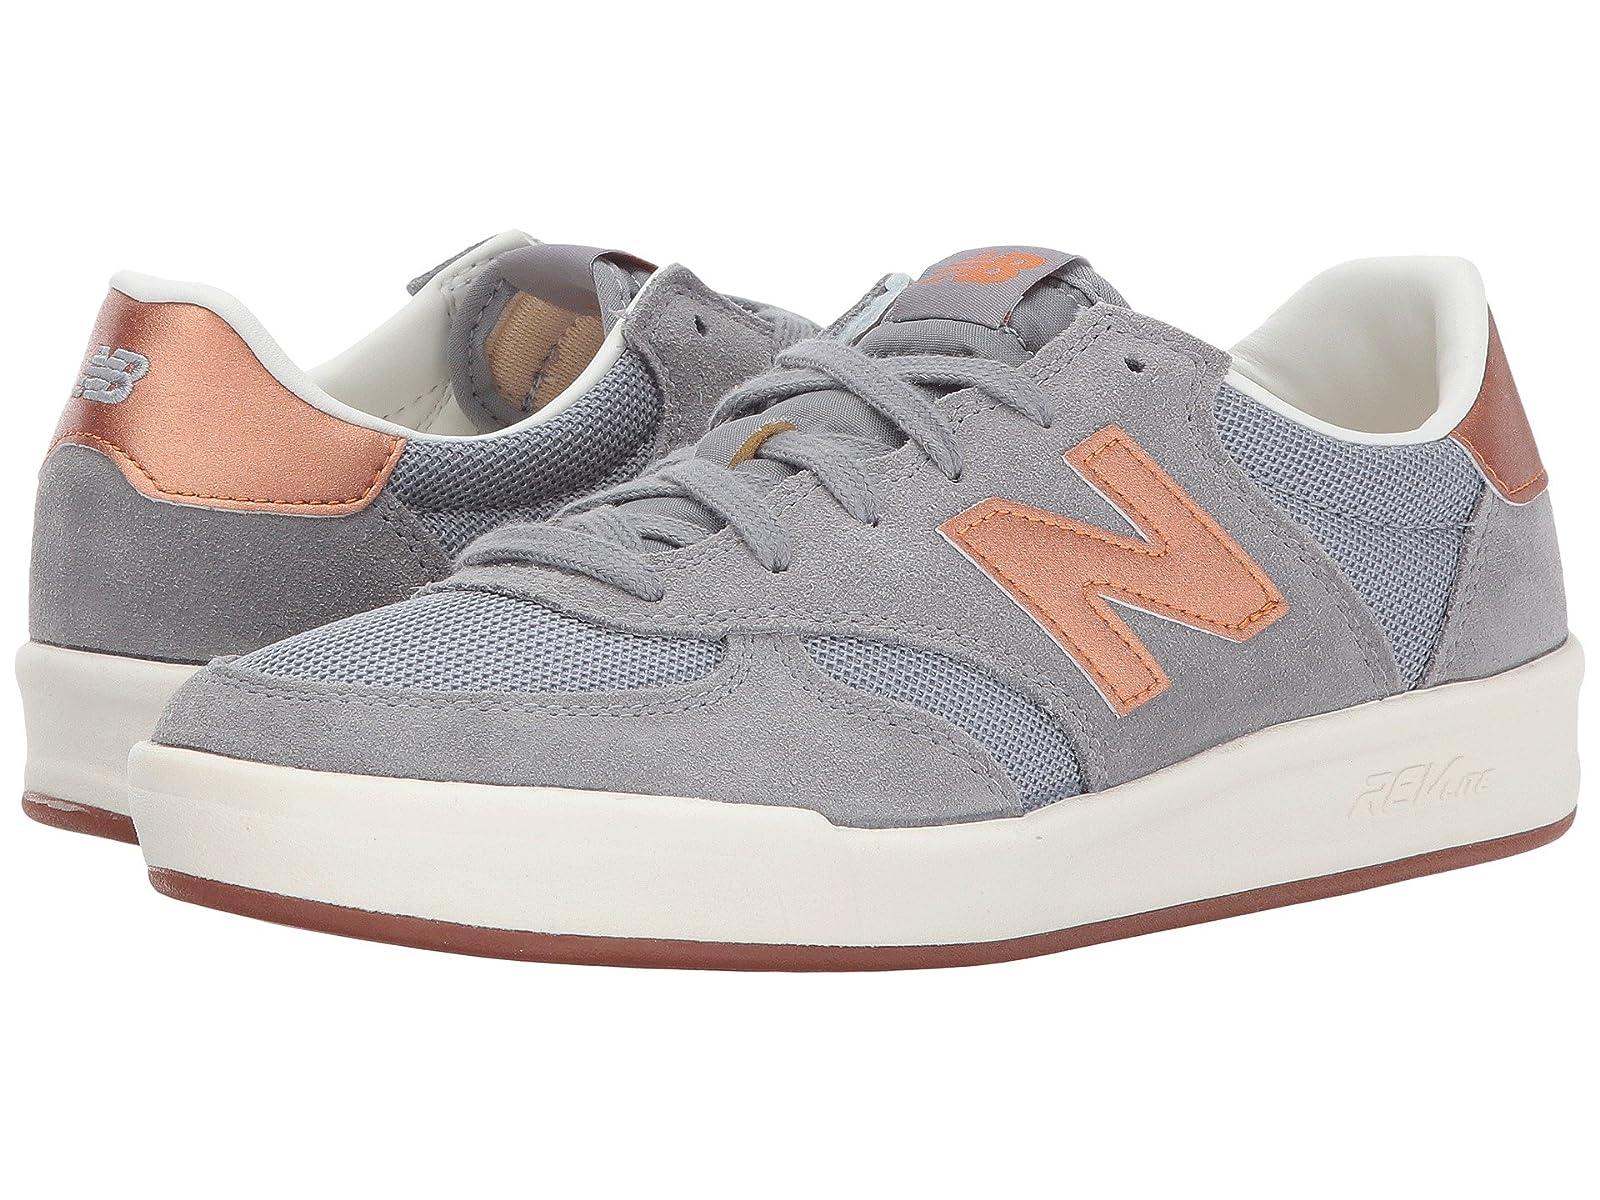 New Balance Classics WRT300Cheap and distinctive eye-catching shoes